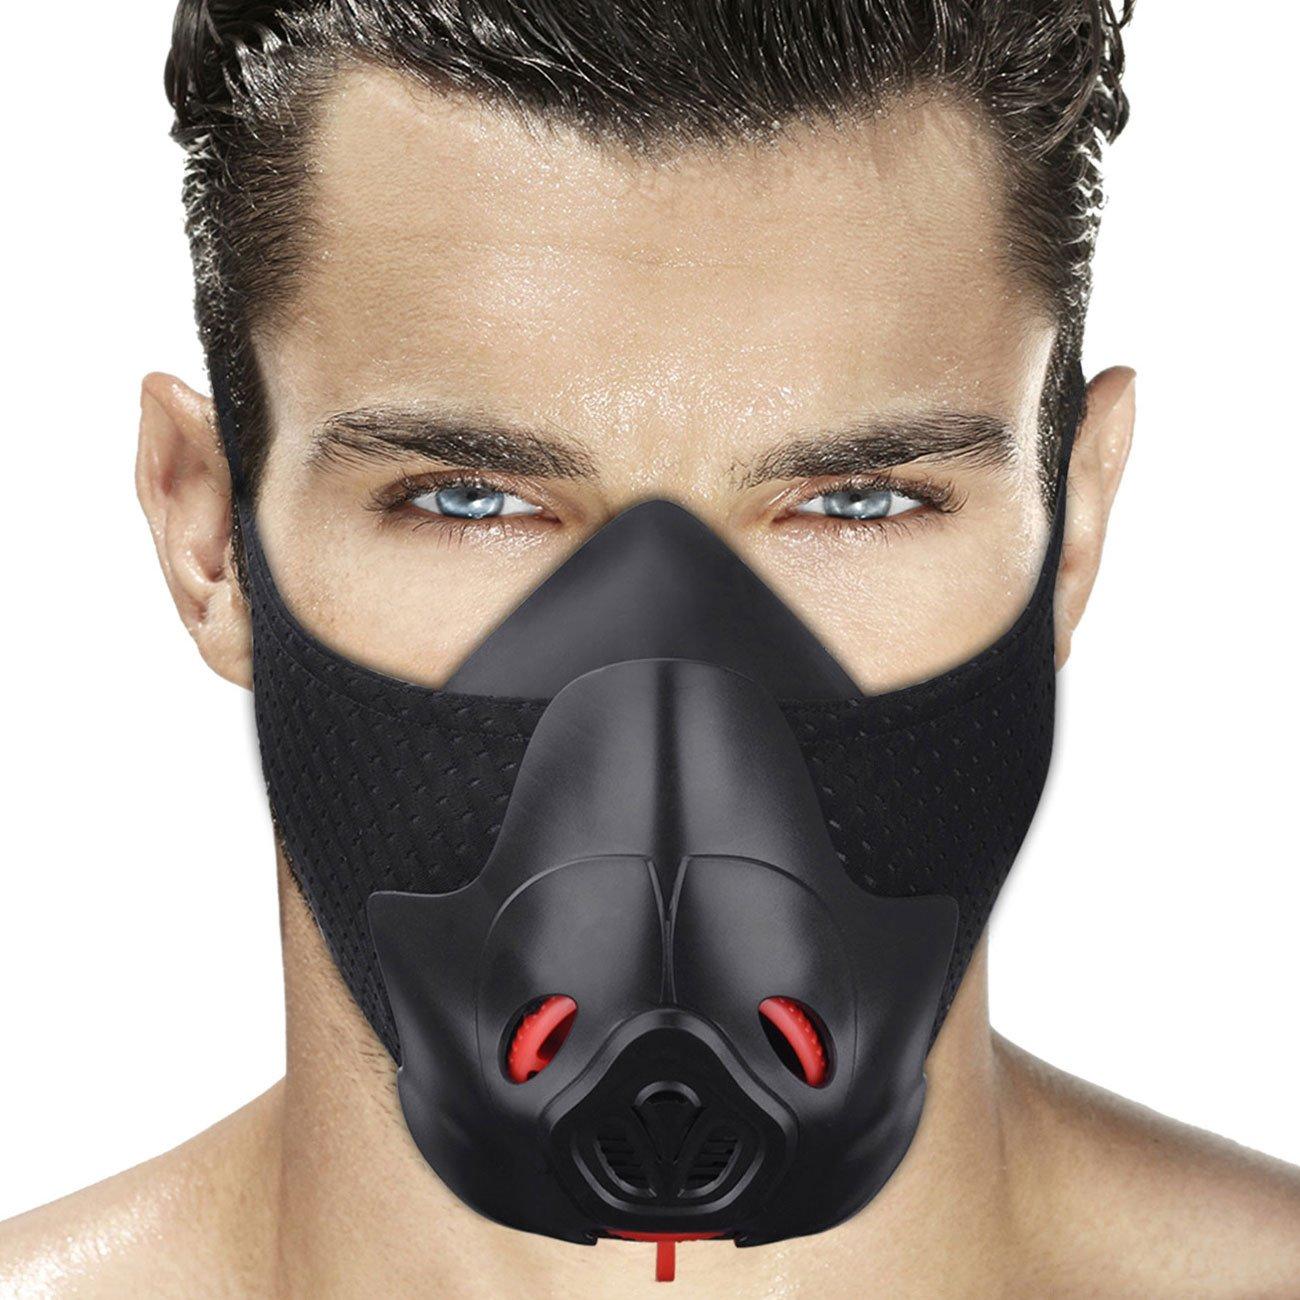 FRIORANGE Sport Workout Training Mask Hypoxic Mask Running Mask Fitness mask Achieve High Altitude Elevation Effects with 3 Level Air Flow Regulator